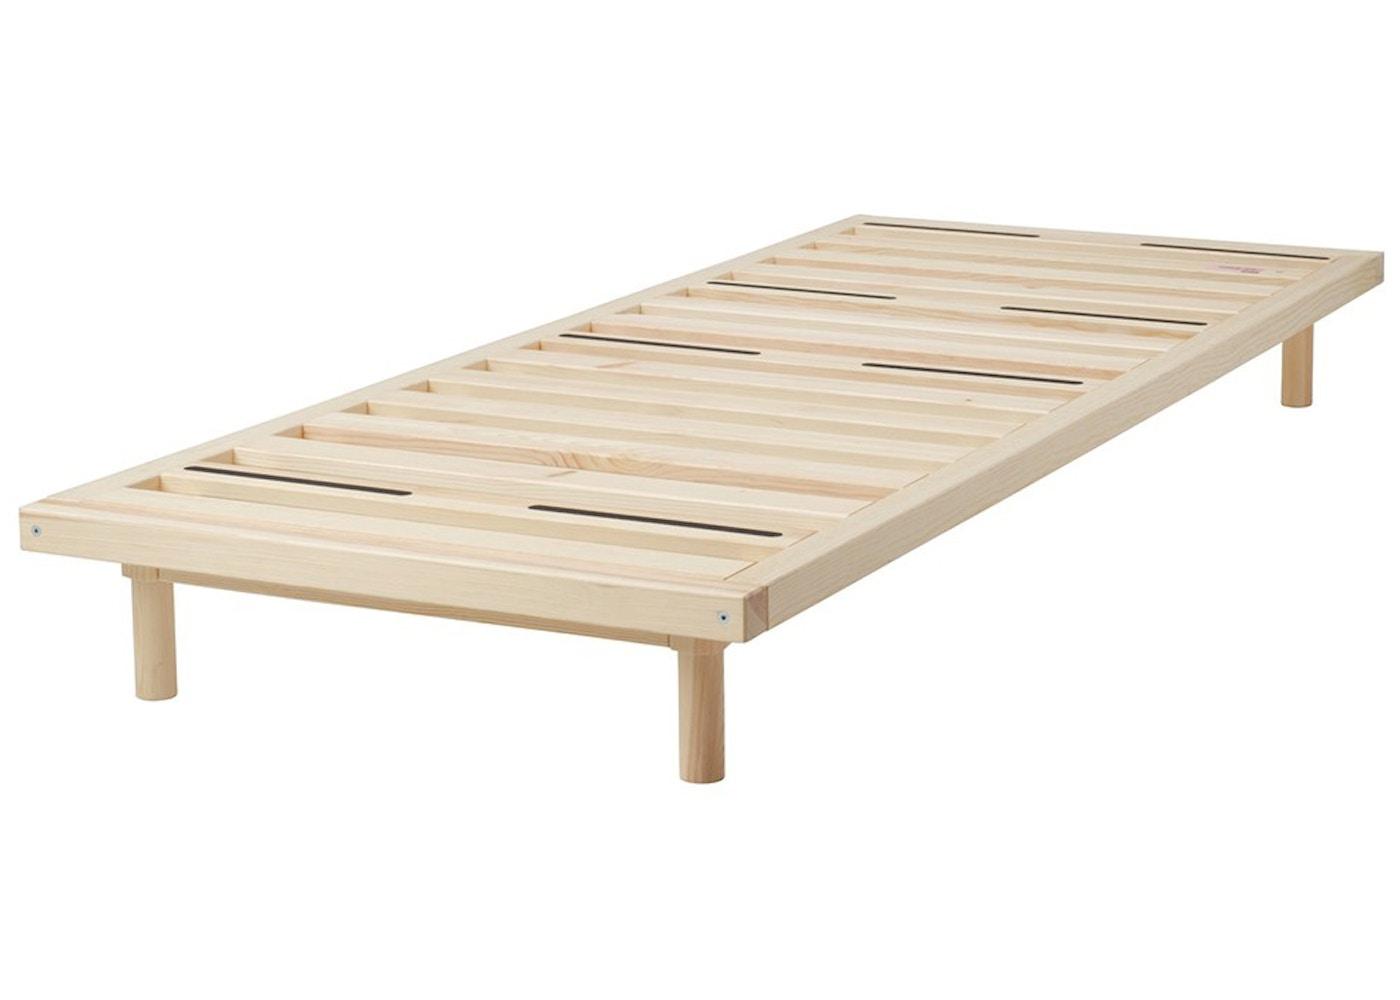 Virgil Abloh x IKEA MARKERAD Bed Frame Brown